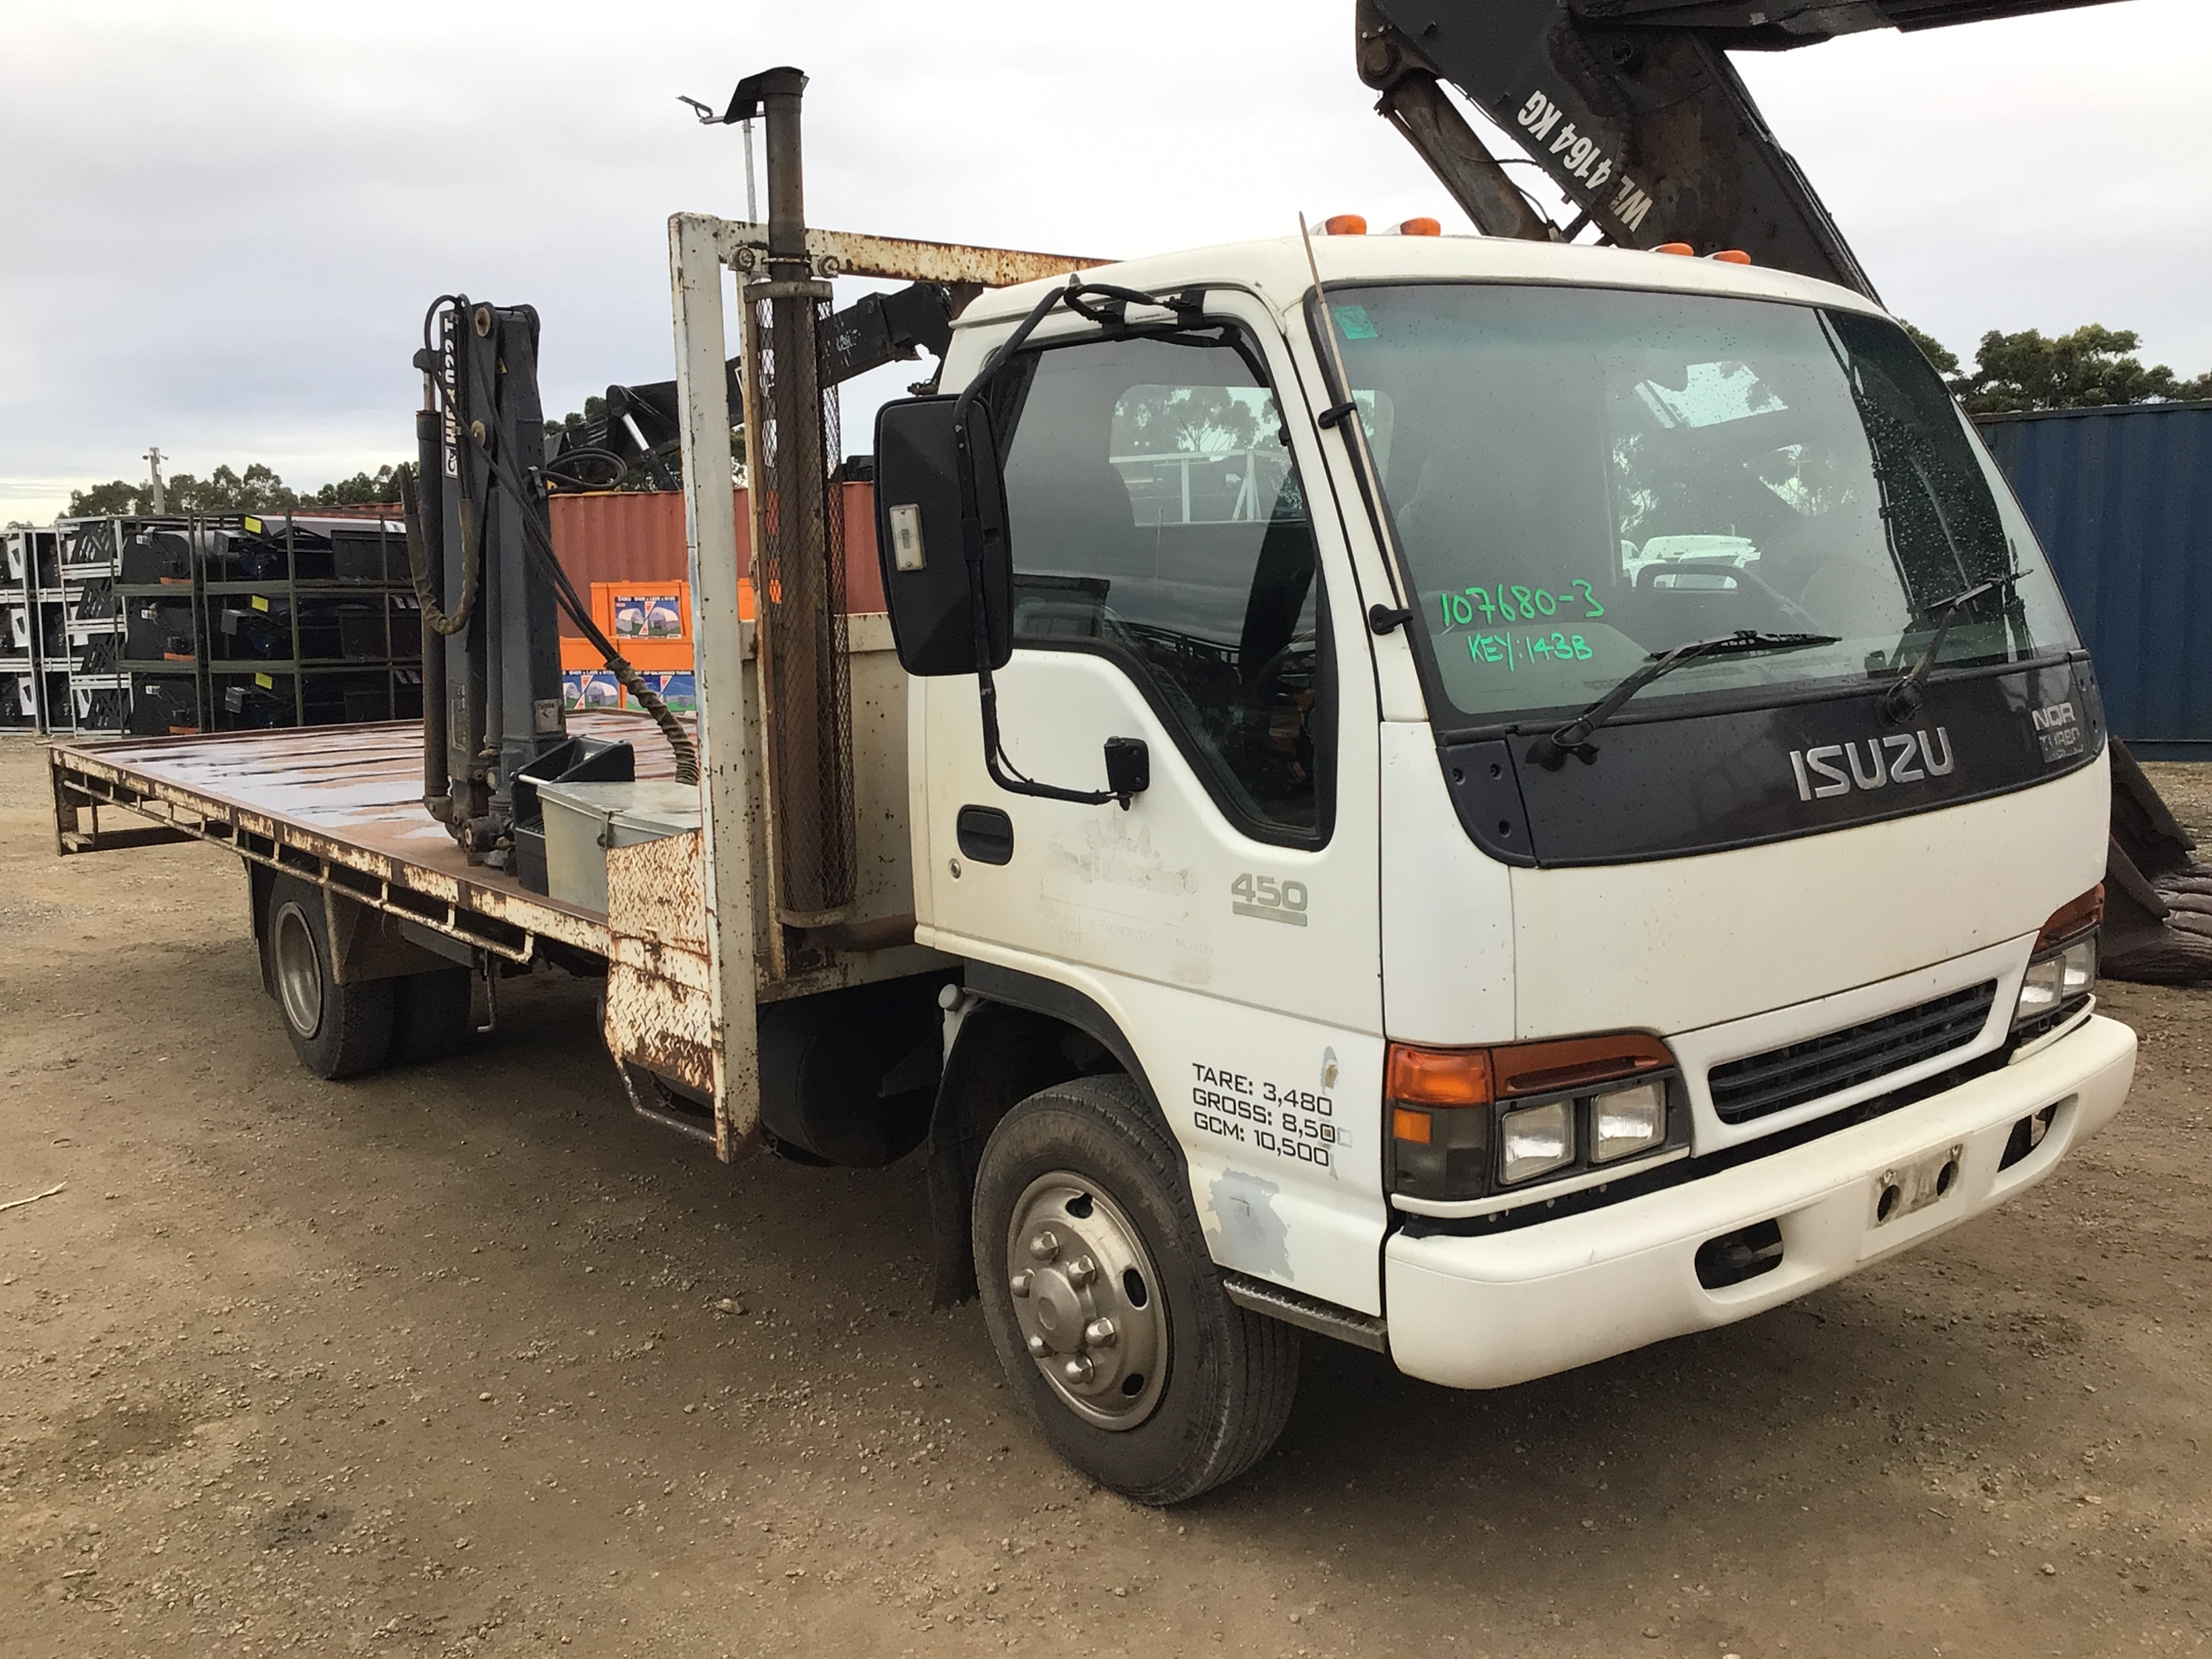 2000 Isuzu NQR 450 4 x 2 Tray Body Truck